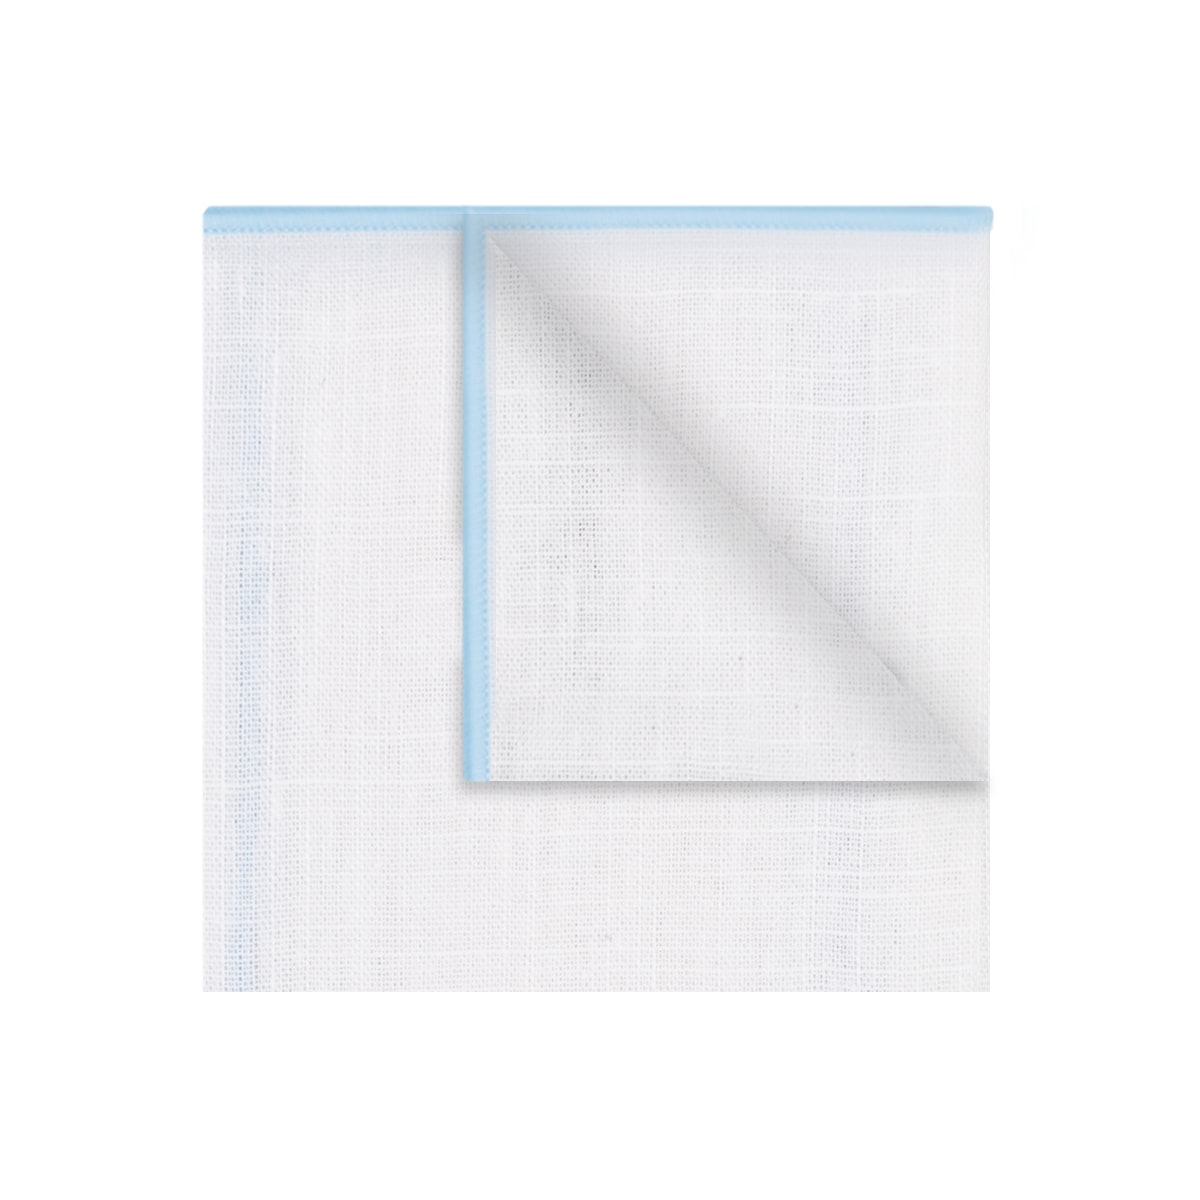 InStitchu Accessories pocket-squareThe Lawson Linen White & Baby Blue Trim Pocket Square